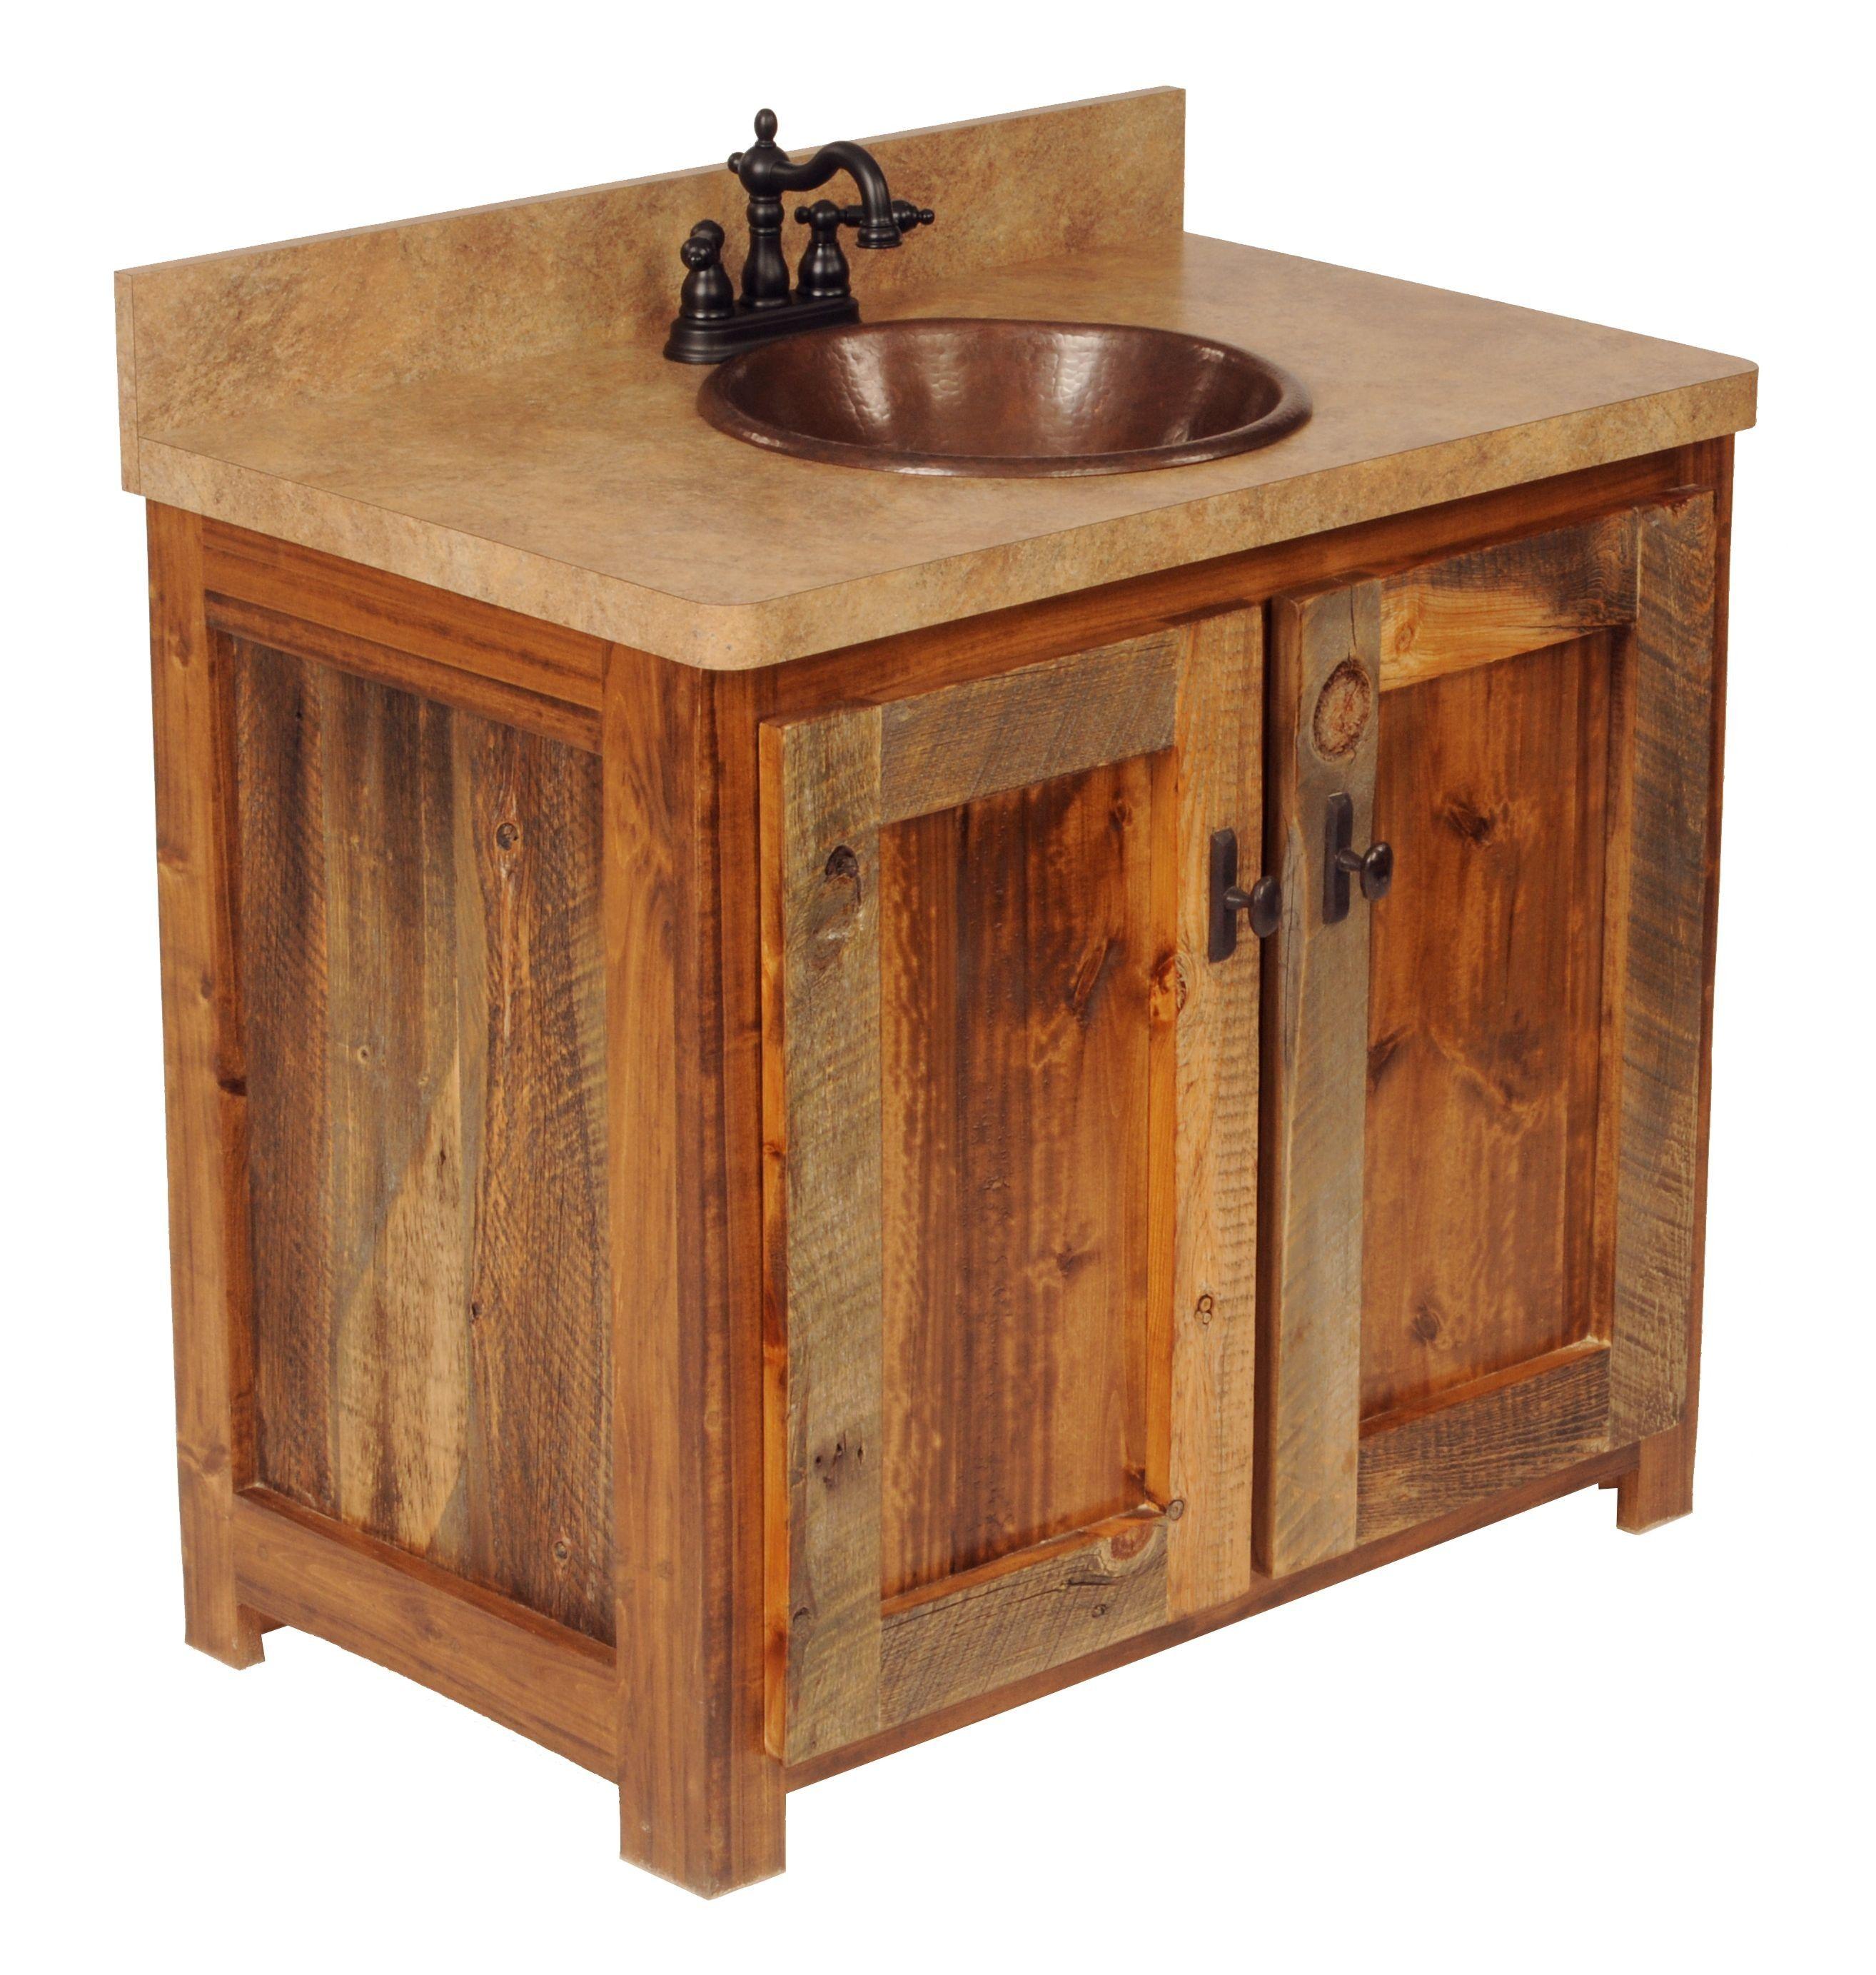 hickory Wood bathroom vanity, Rustic bathroom